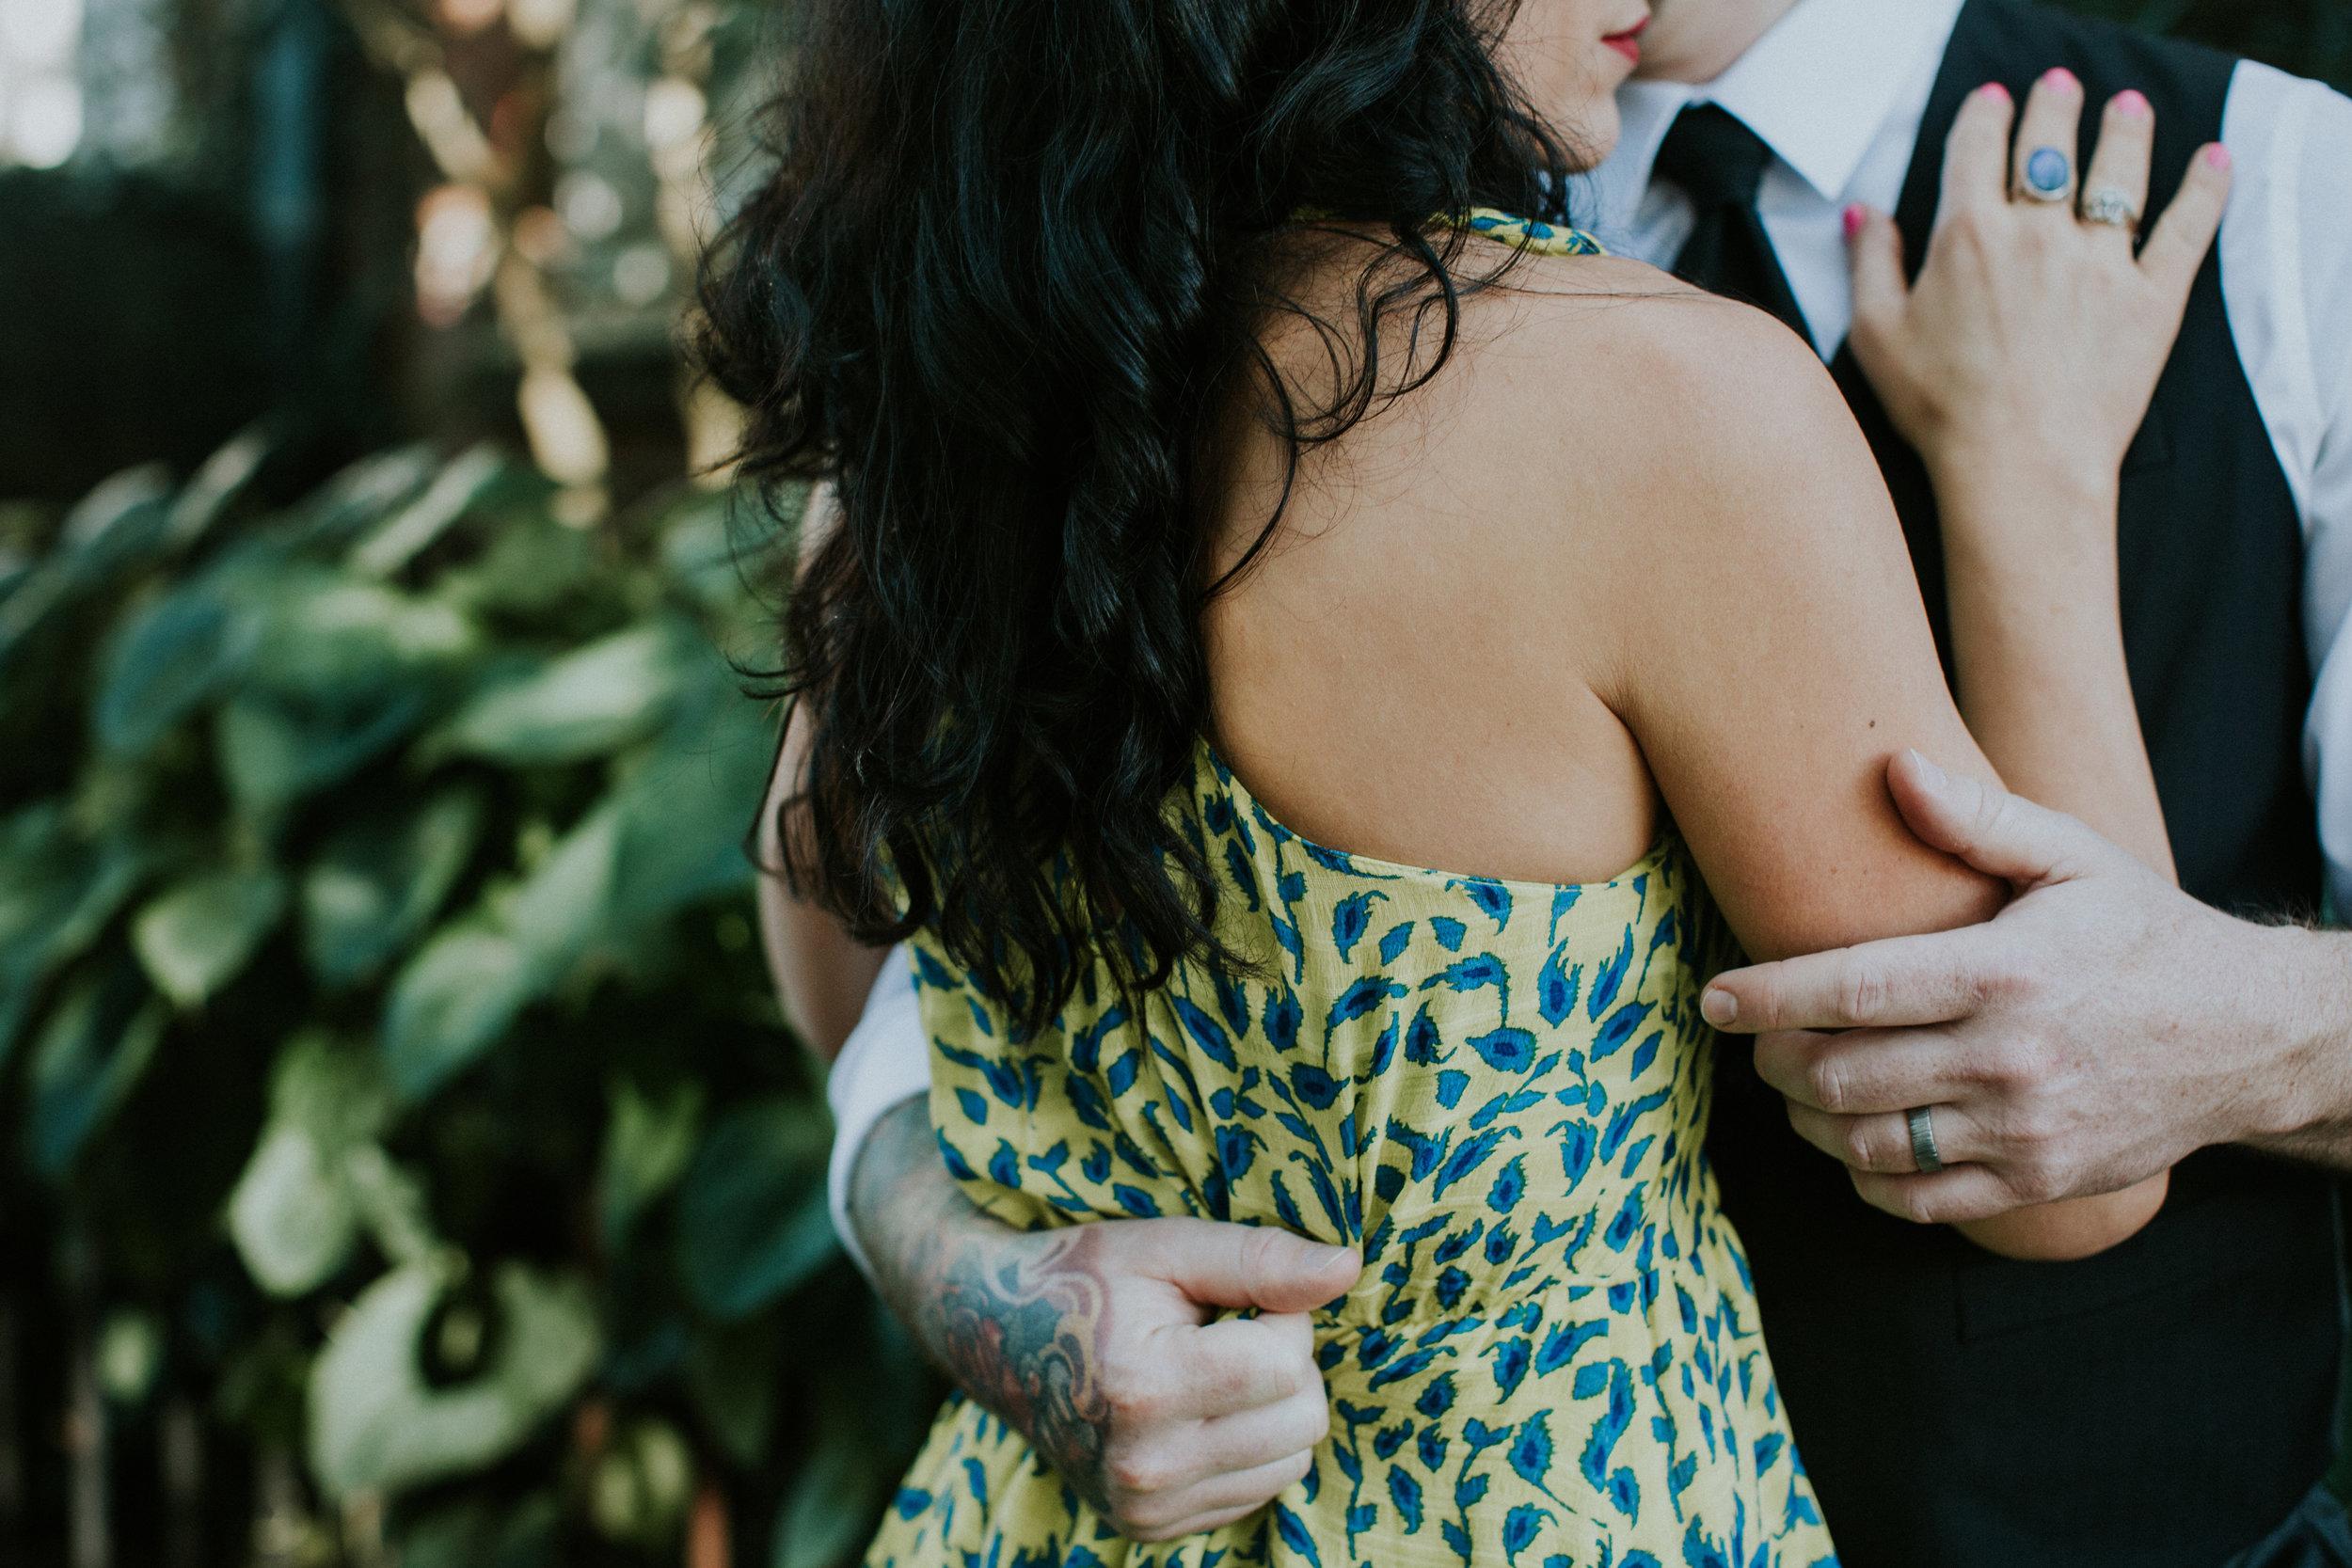 CindyGiovagnoliPhotography_Seattle_Washington_PNW_Couple_Engagement_Portrait_Photography-024.jpg